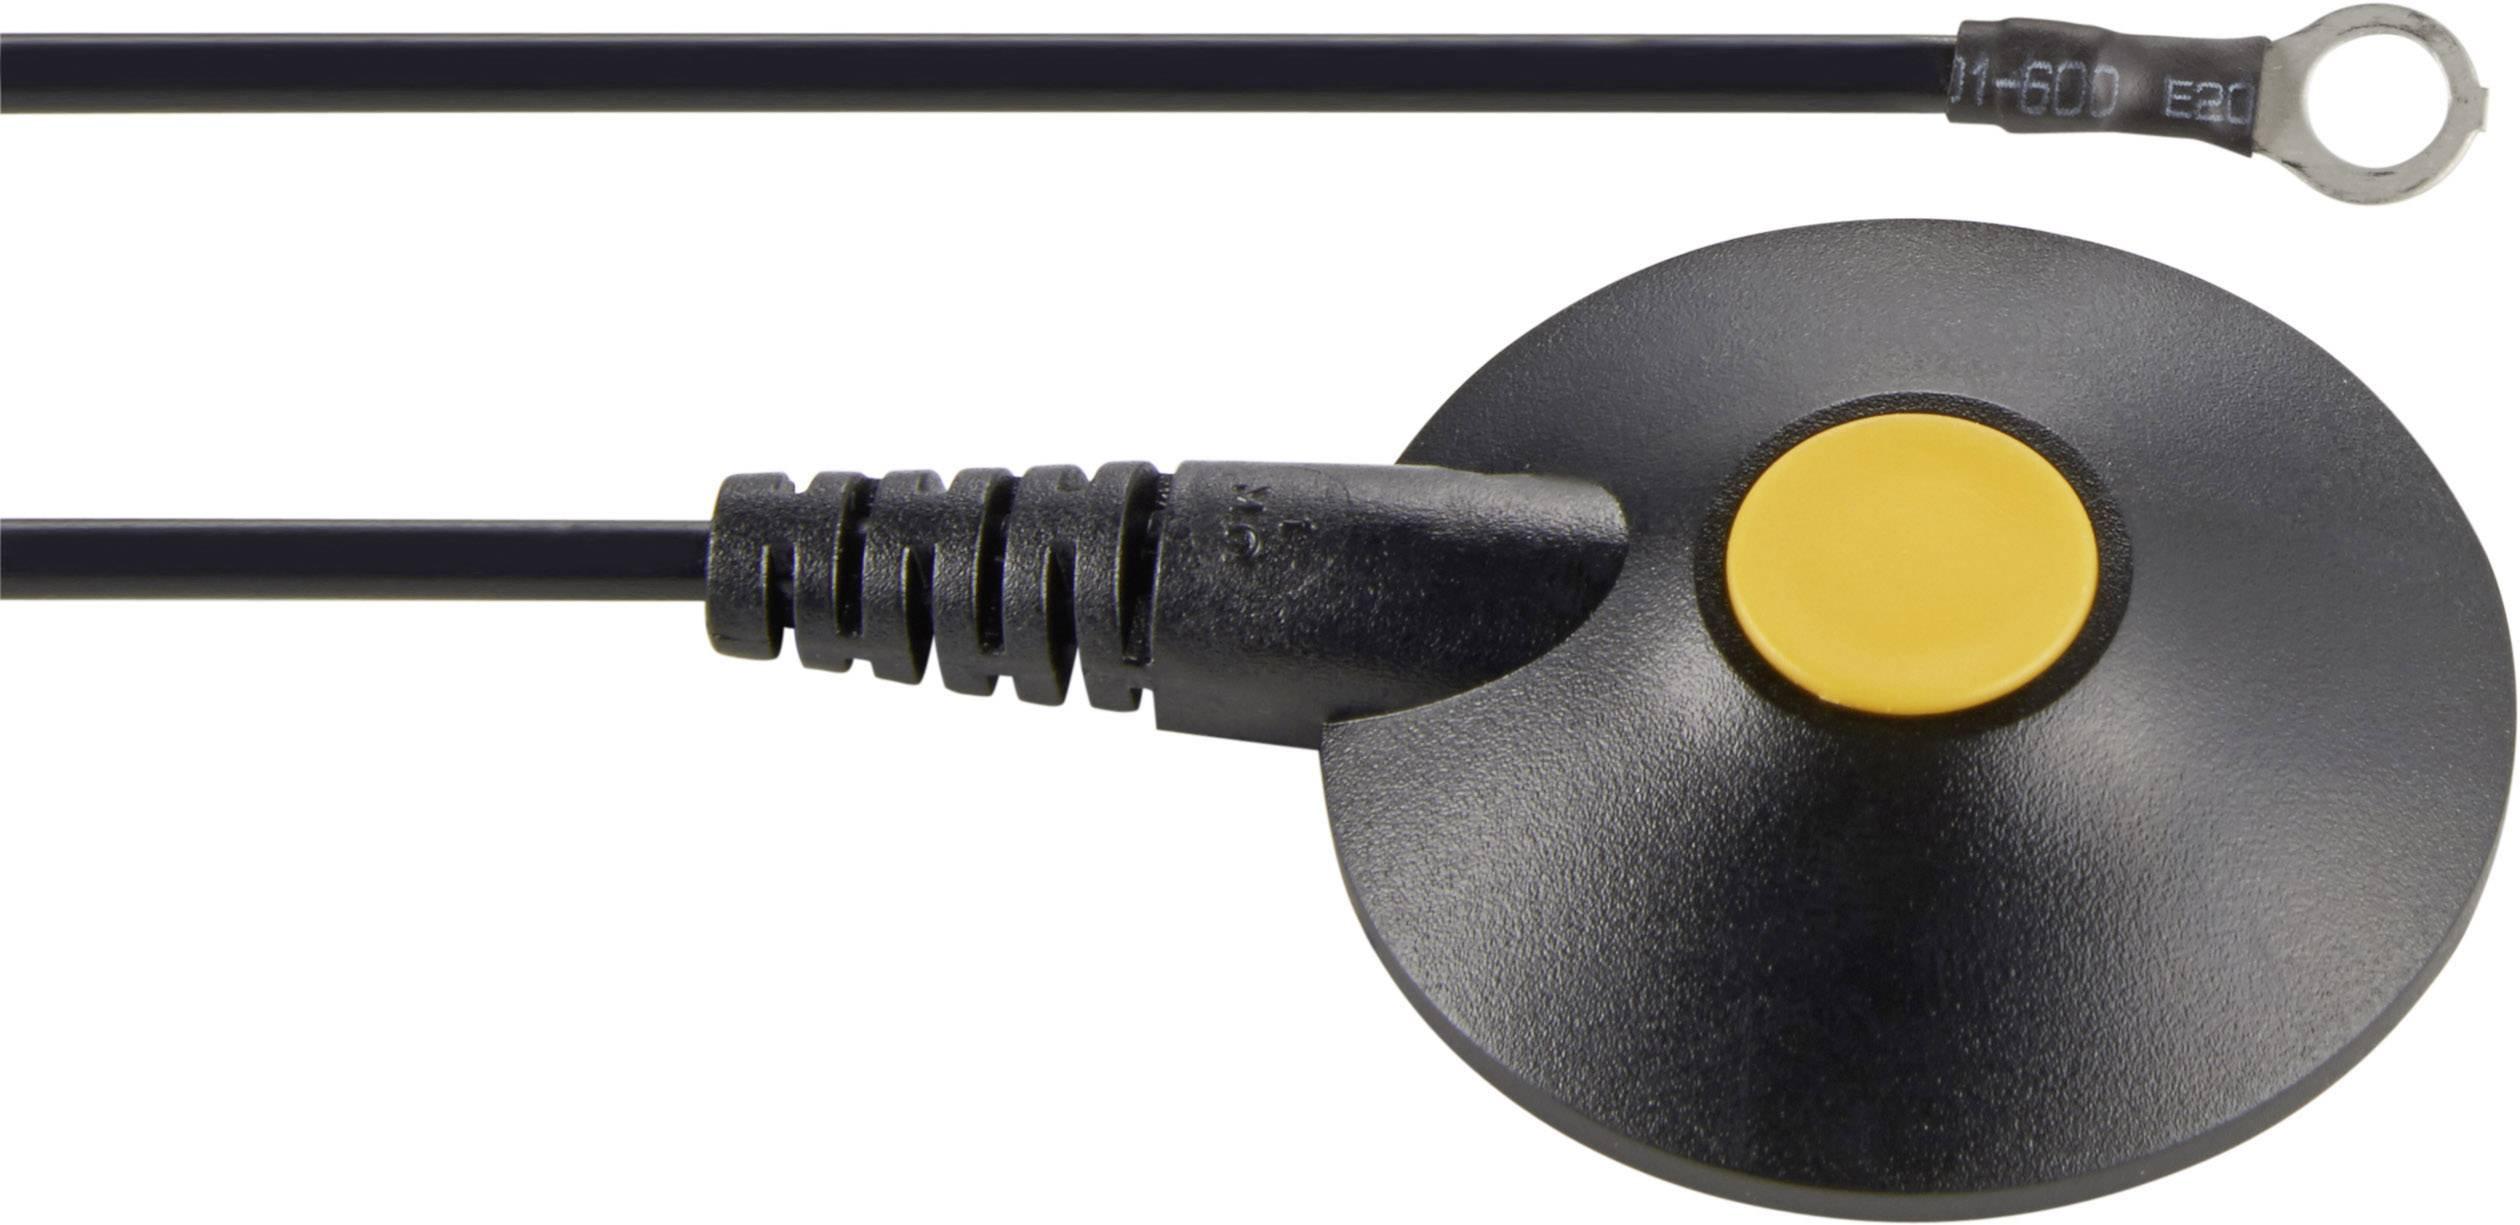 ESD uzemňovací kábel Wolfgang Warmbier 2250.790, 1.80 m